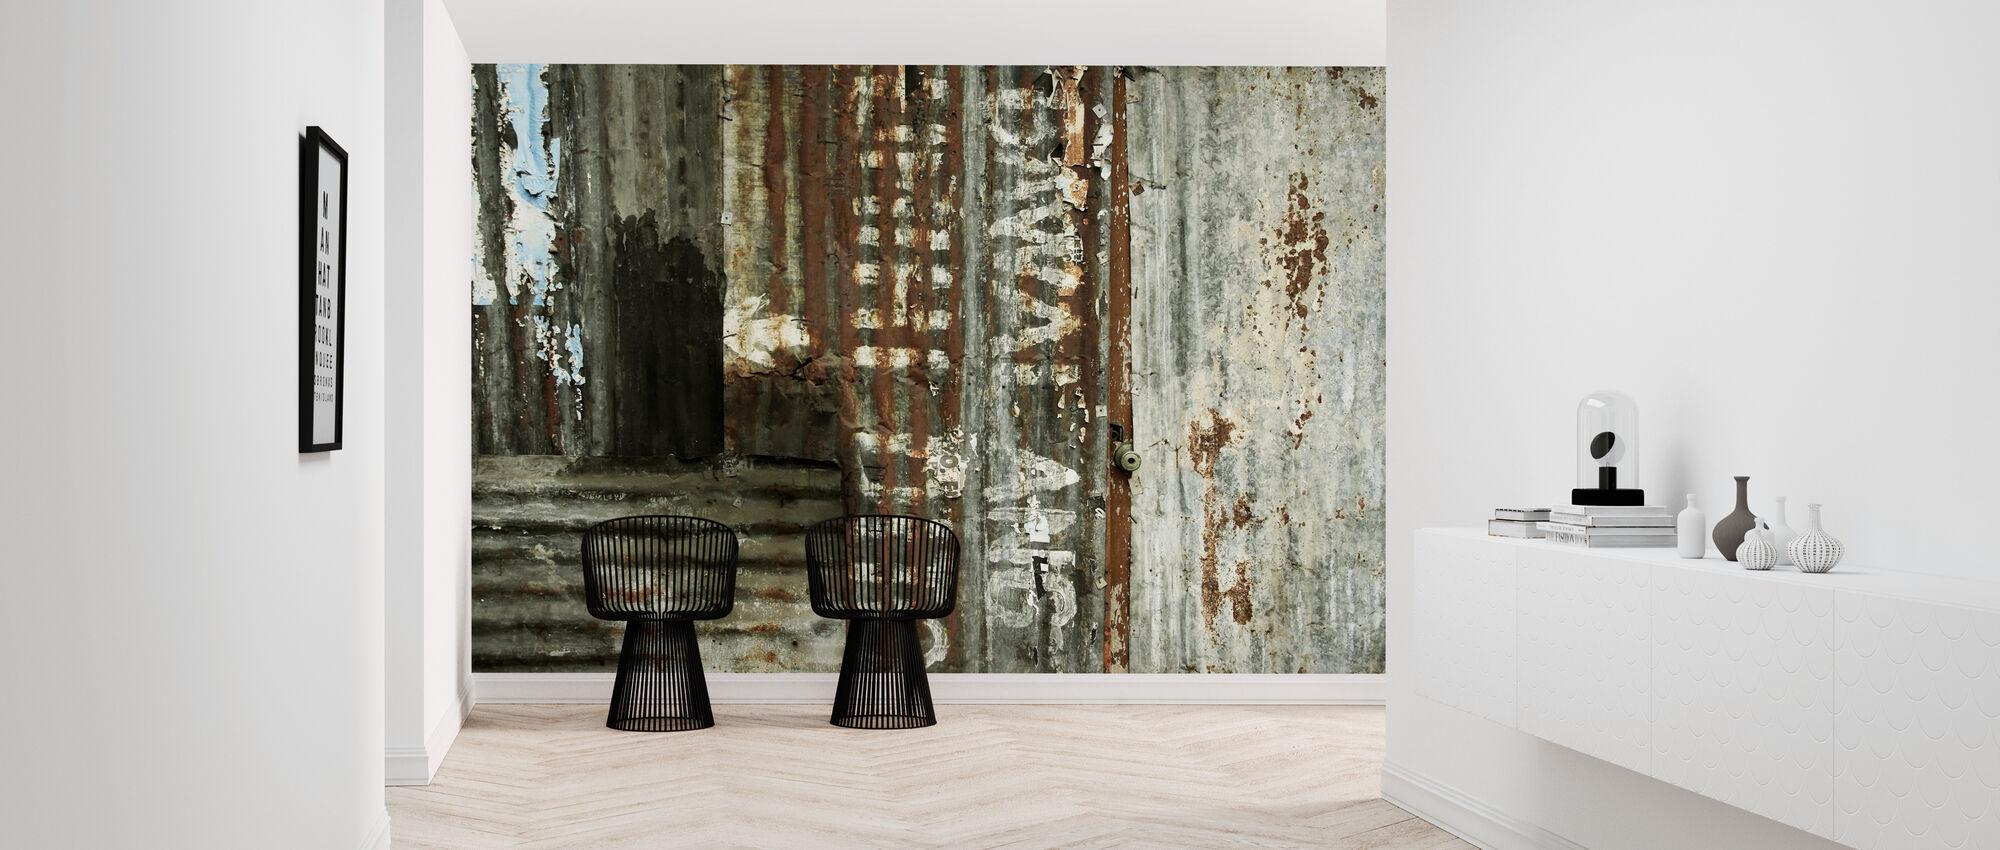 Corrugated Iron Sheeting - Wallpaper - Hallway